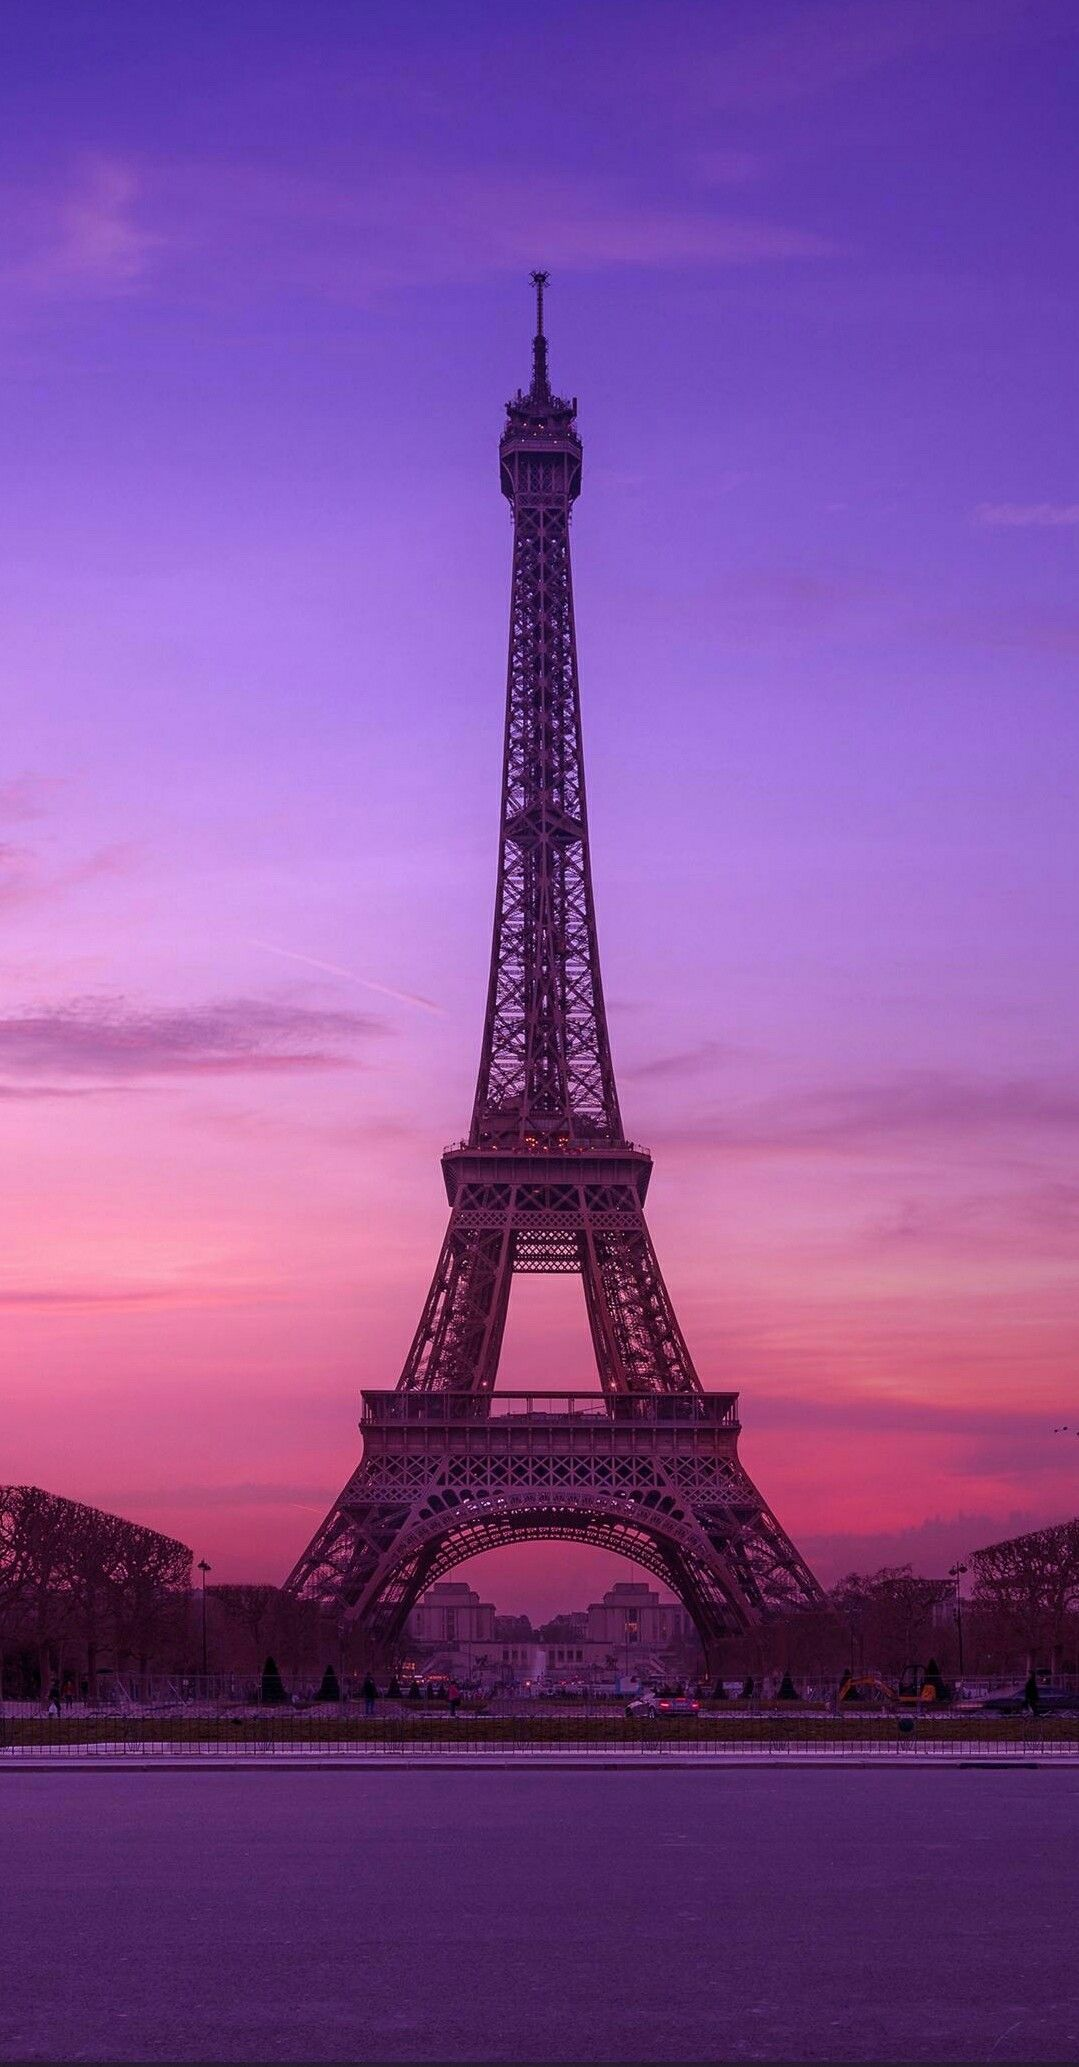 Paris wallpaper image by Lina Mustafa on Wallpaper